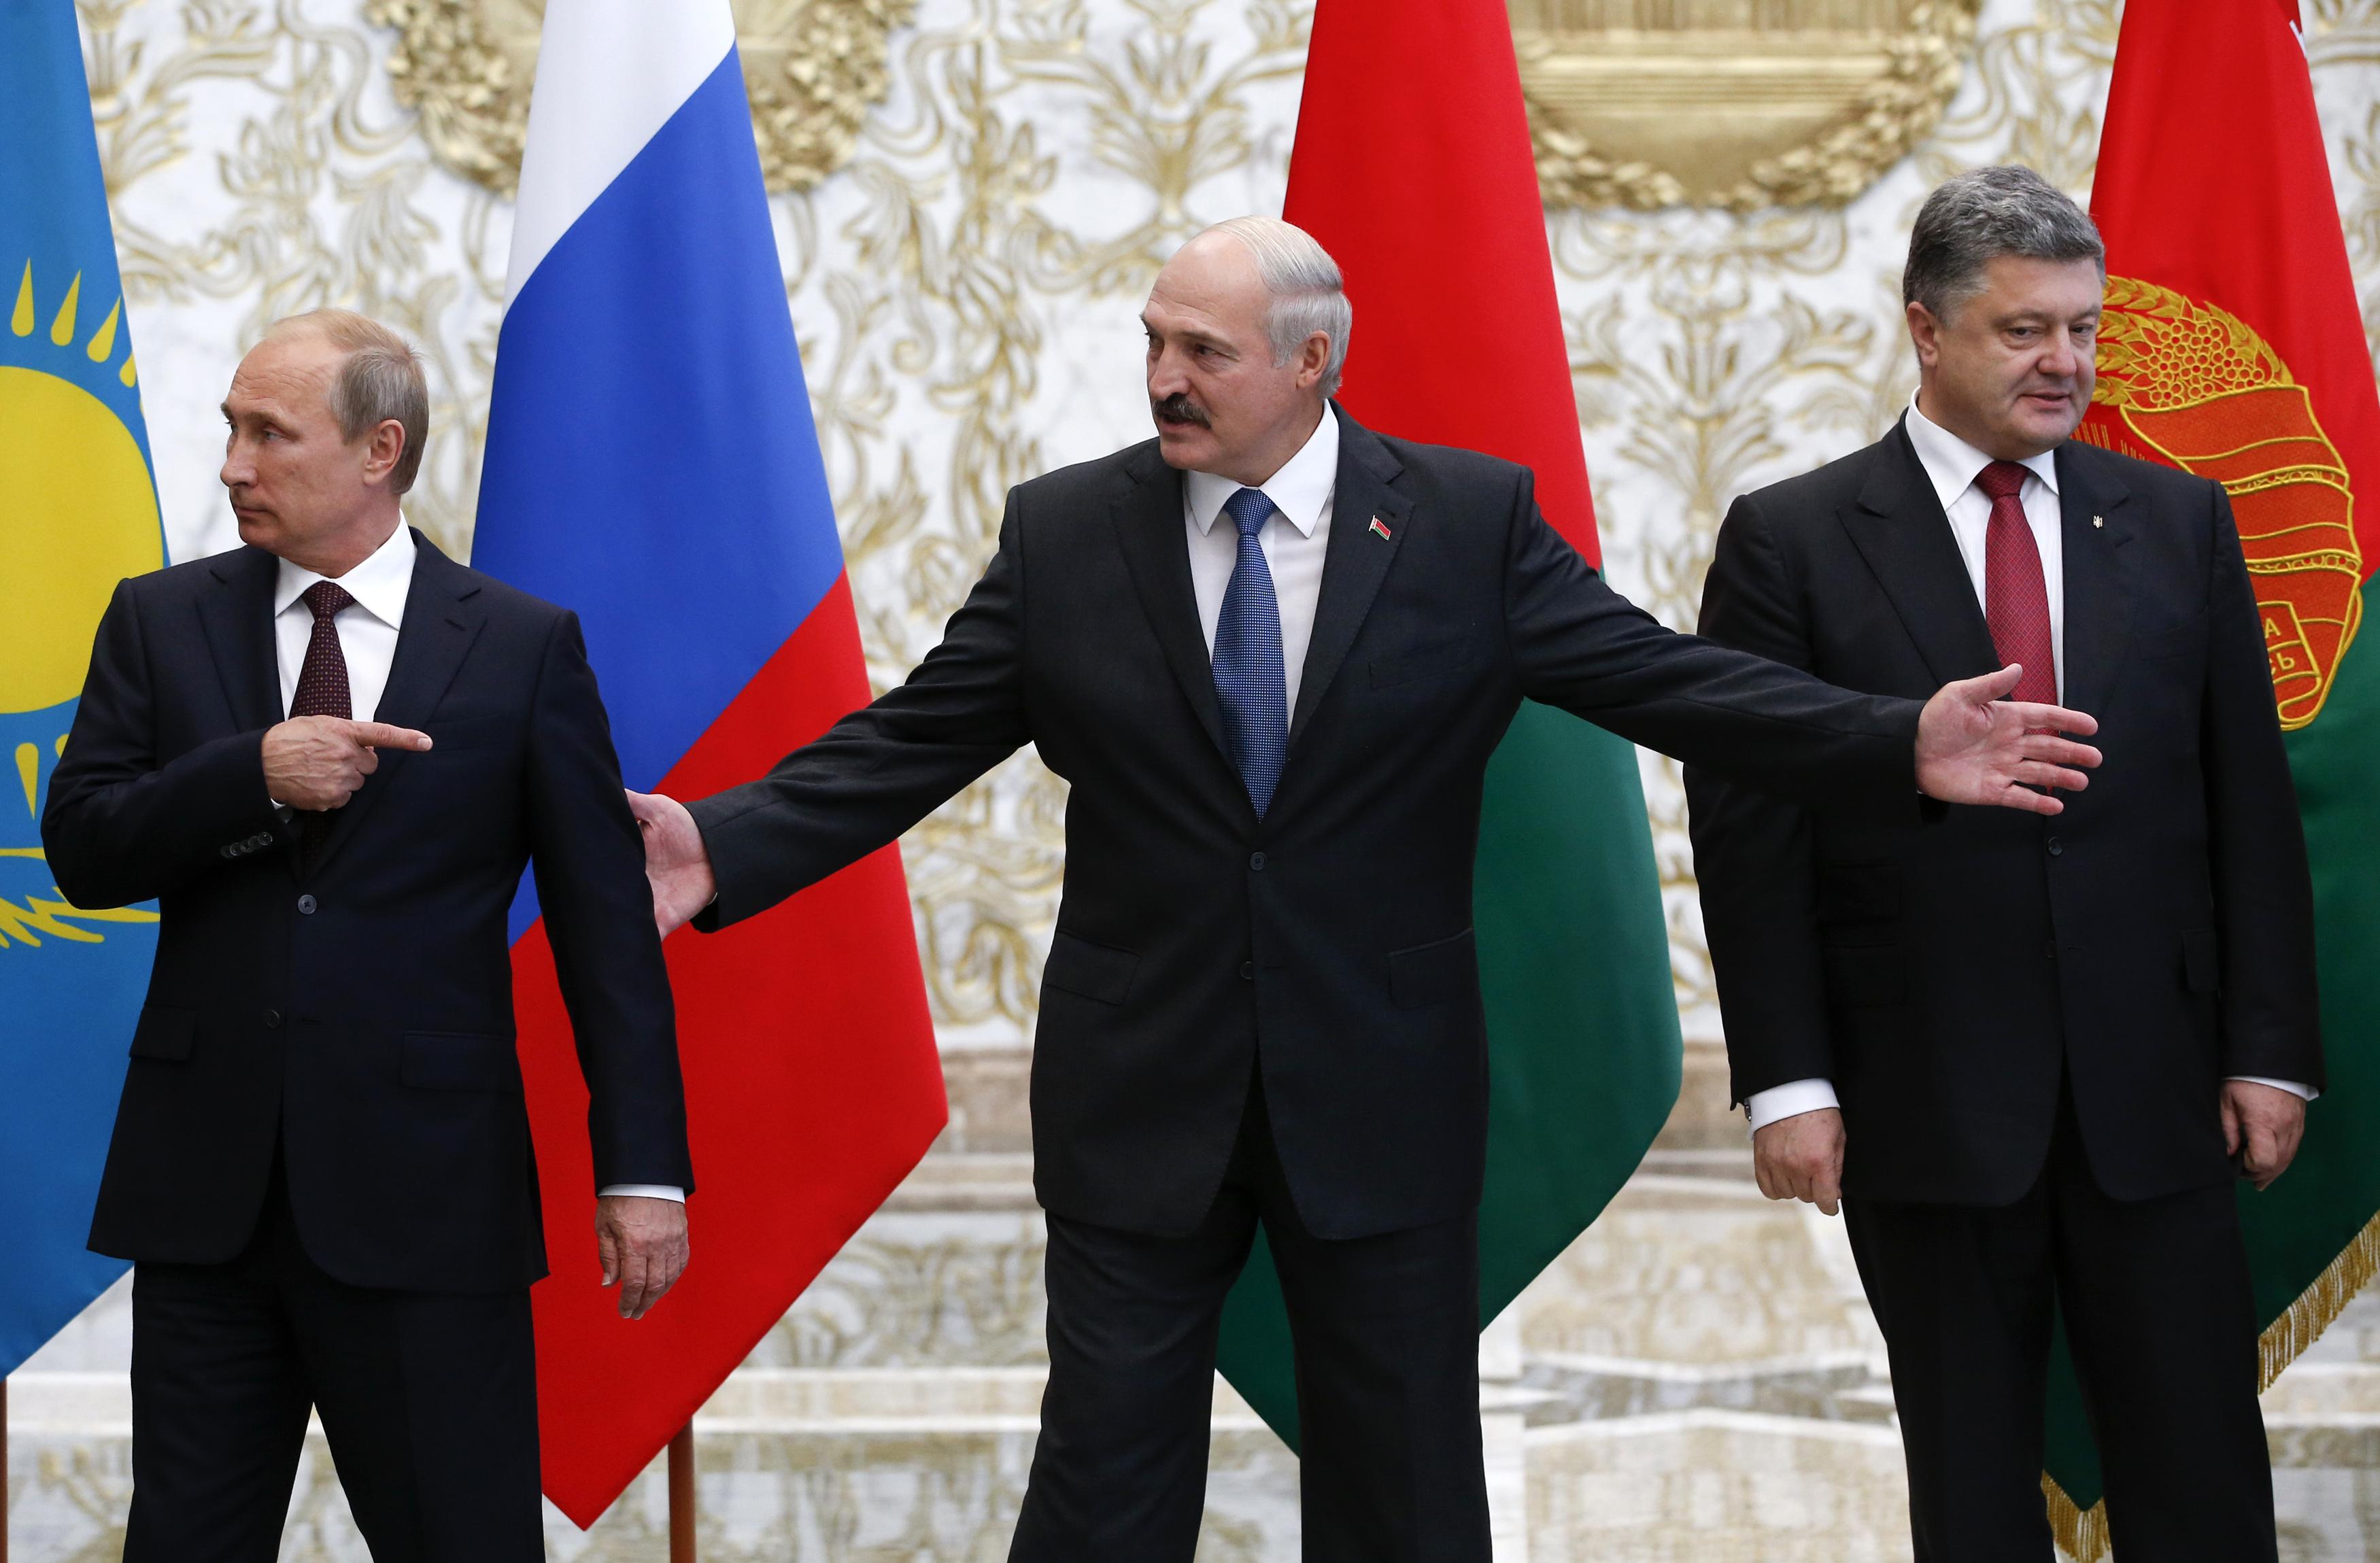 Russia's President Vladimir Putin, Belarus' President Alexander Lukashenko and Ukraine's President Petro Poroshenko react while posing for a group photo during peace talks that started in Minsk on August 26, 2014.